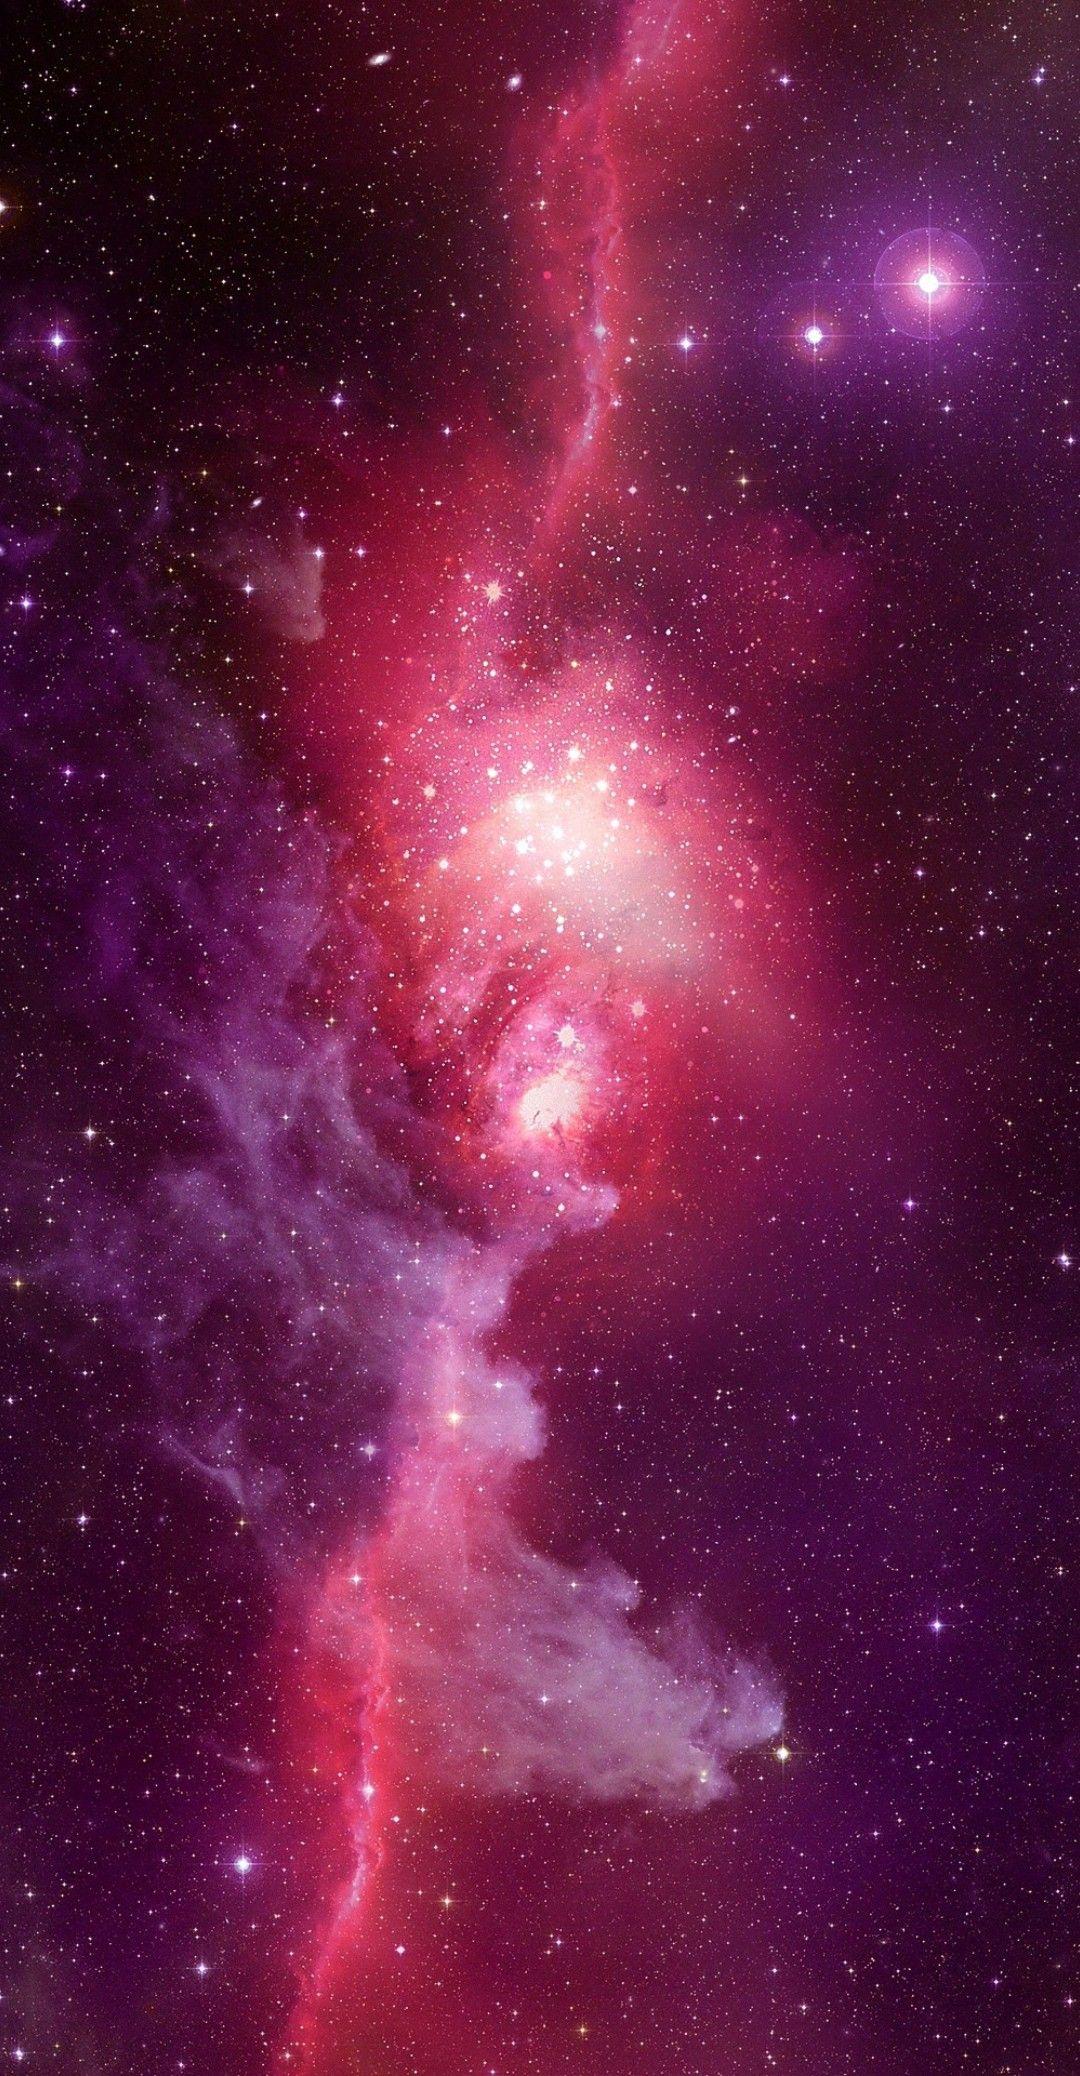 Pin By Rijad On Wallpapers Galaxy Wallpaper Galaxy Background Pink Galaxy Background